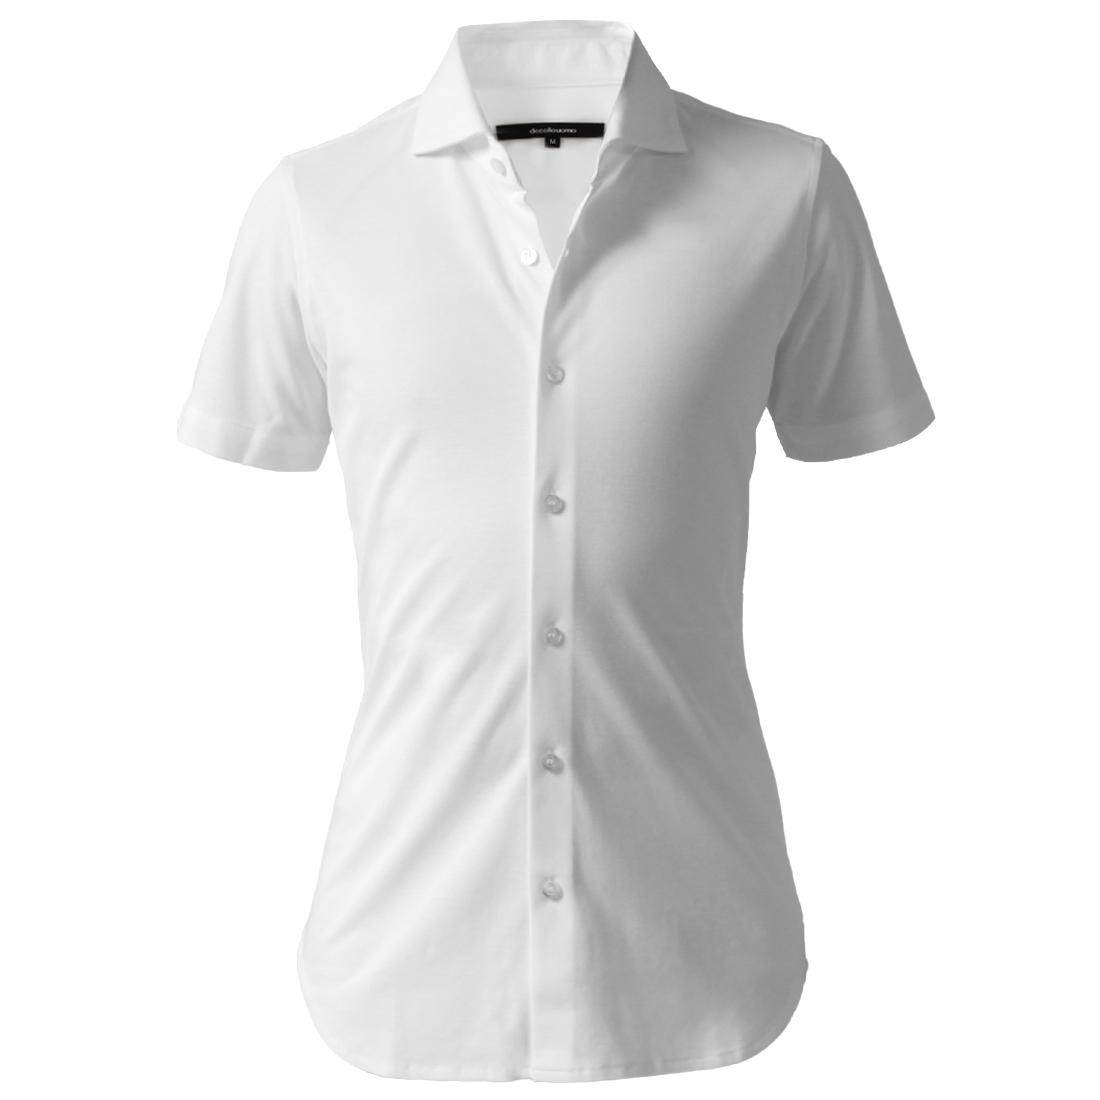 DJS-004 decollouomo メンズドレスシャツ 半袖 concorde - ピュアホワイト